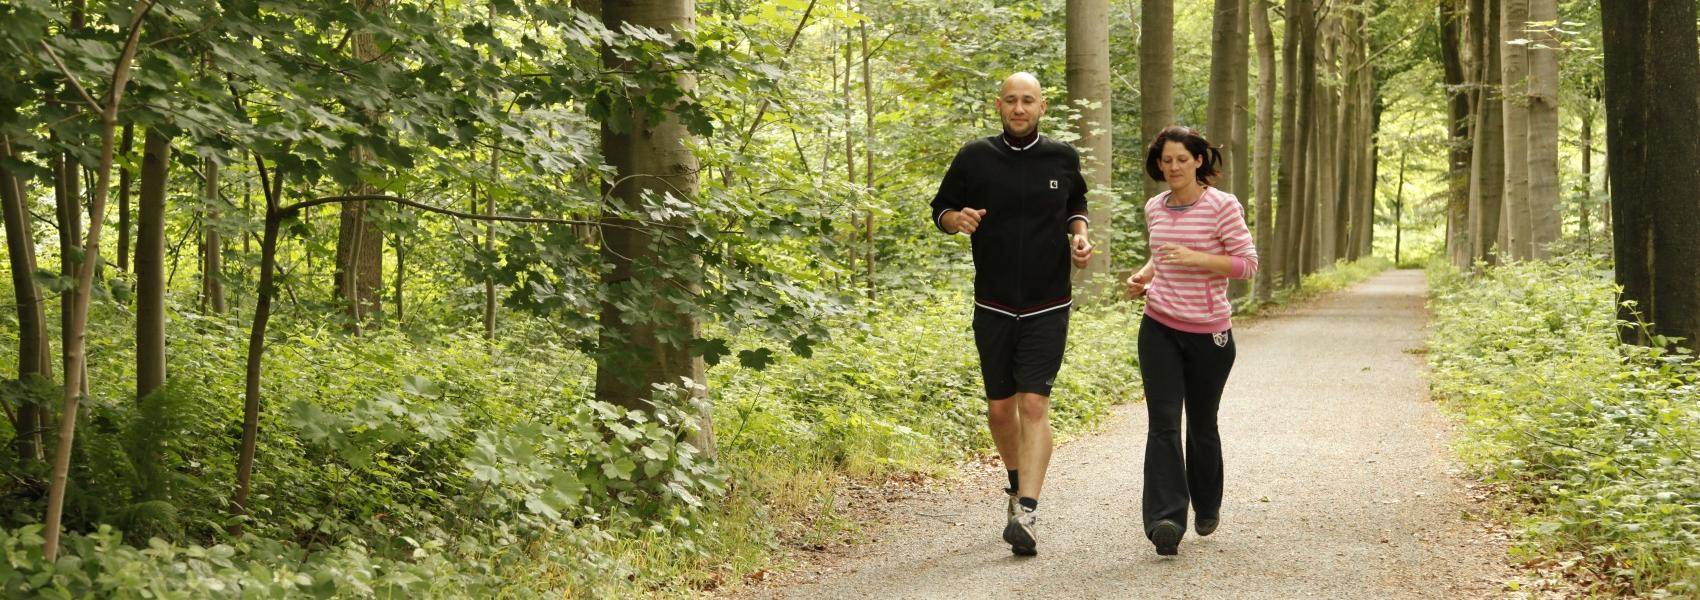 2 joggers in het bos